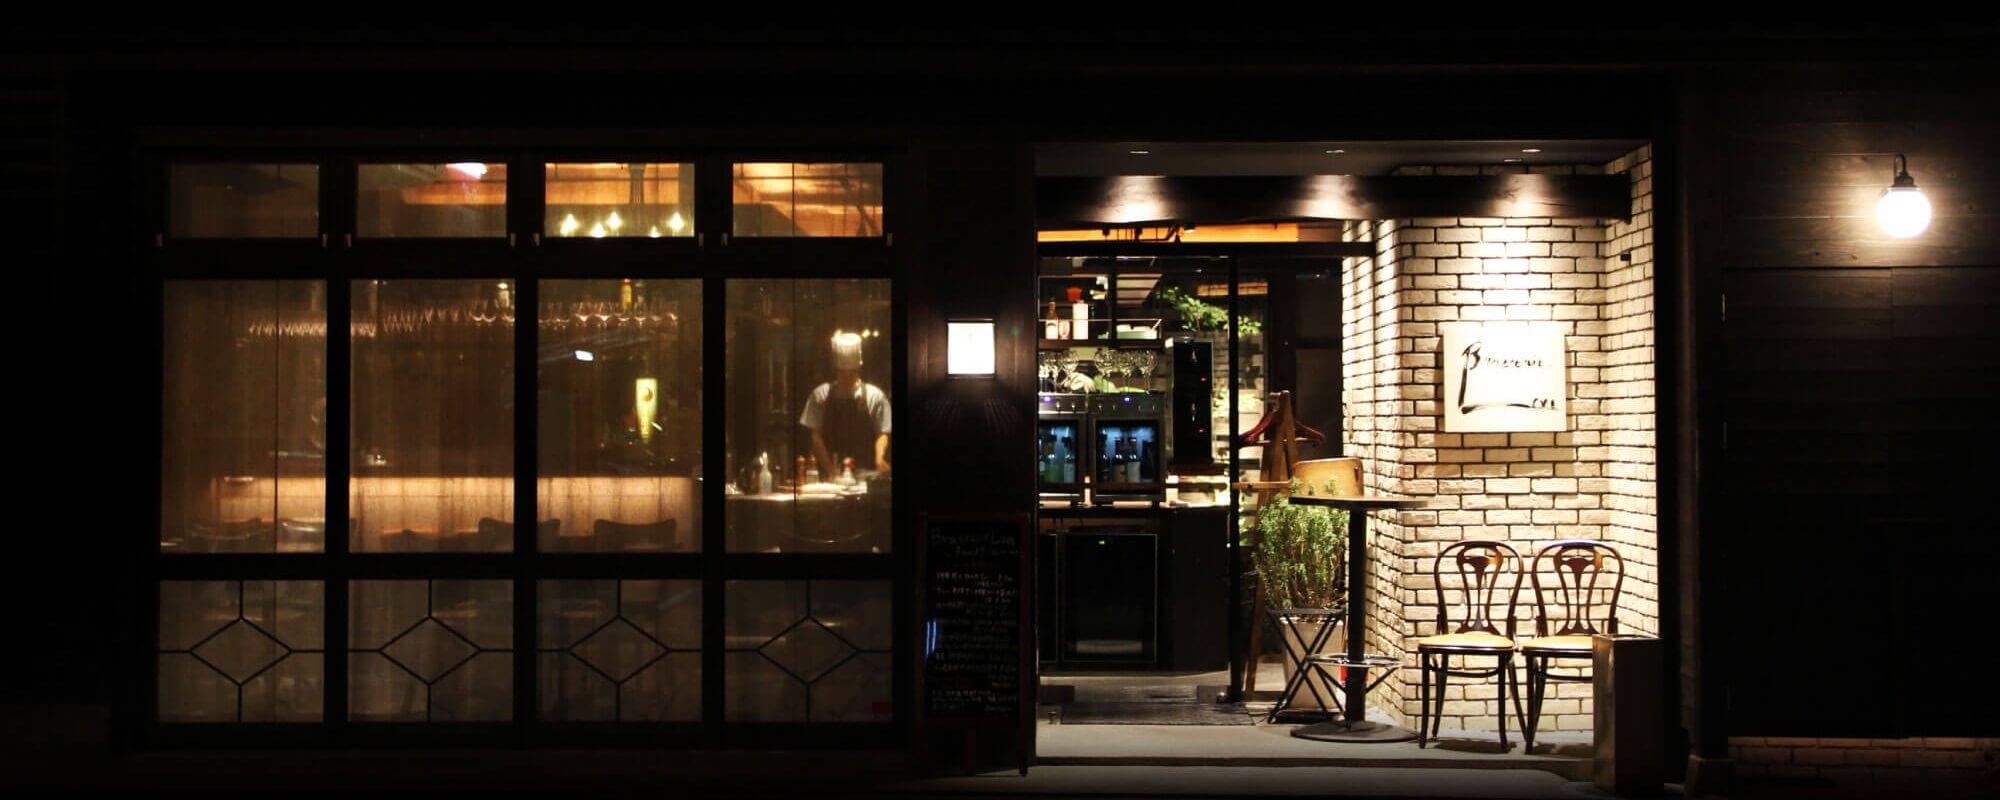 Brasserie Louの店構え